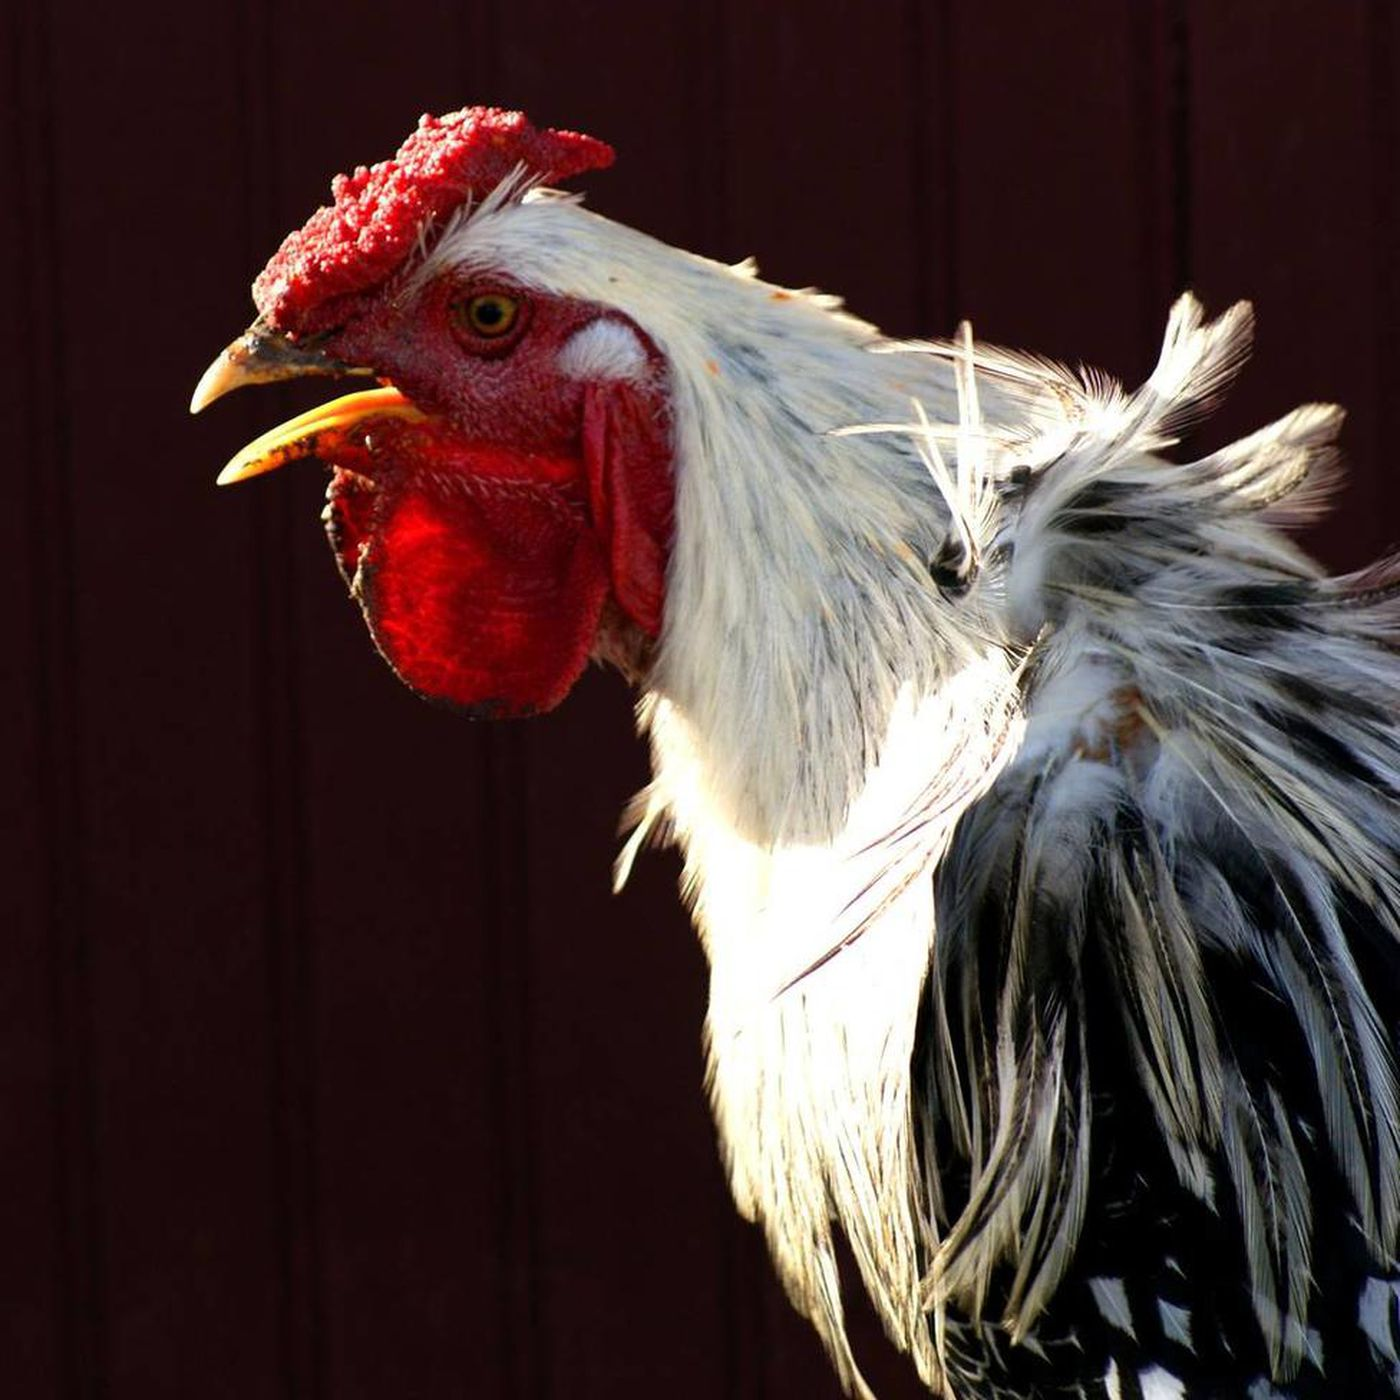 The downside of raising backyard chickens - Deseret News